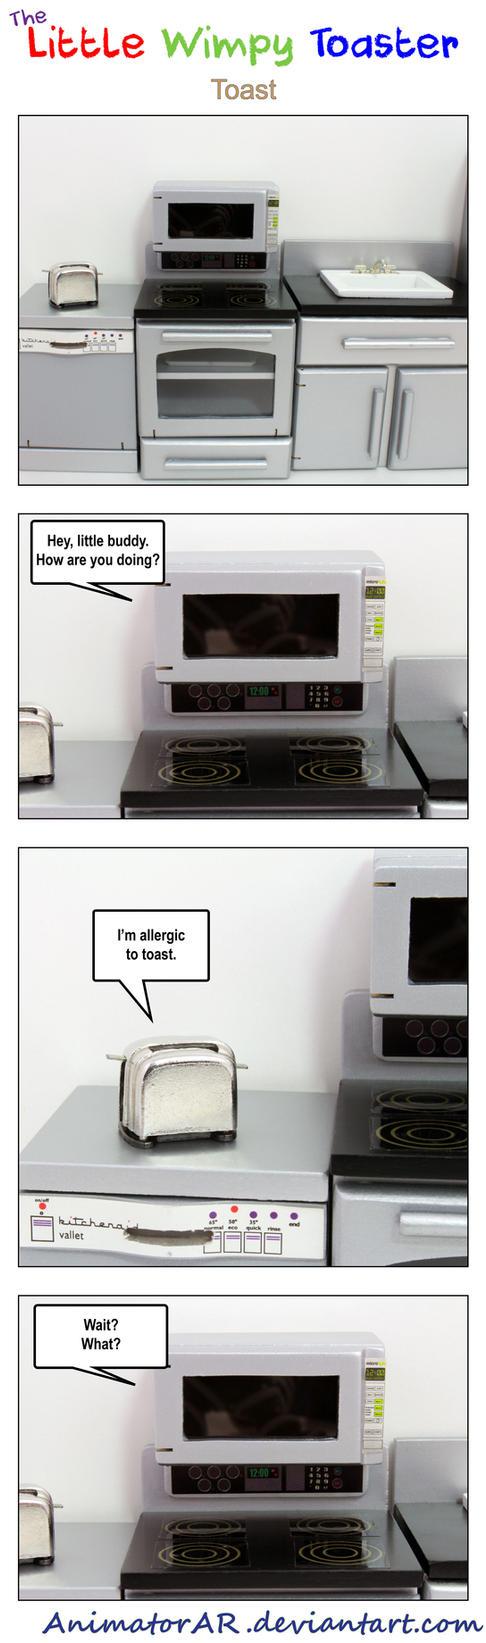 The Little Wimpy Toaster Comic 1 by AnimatorAR